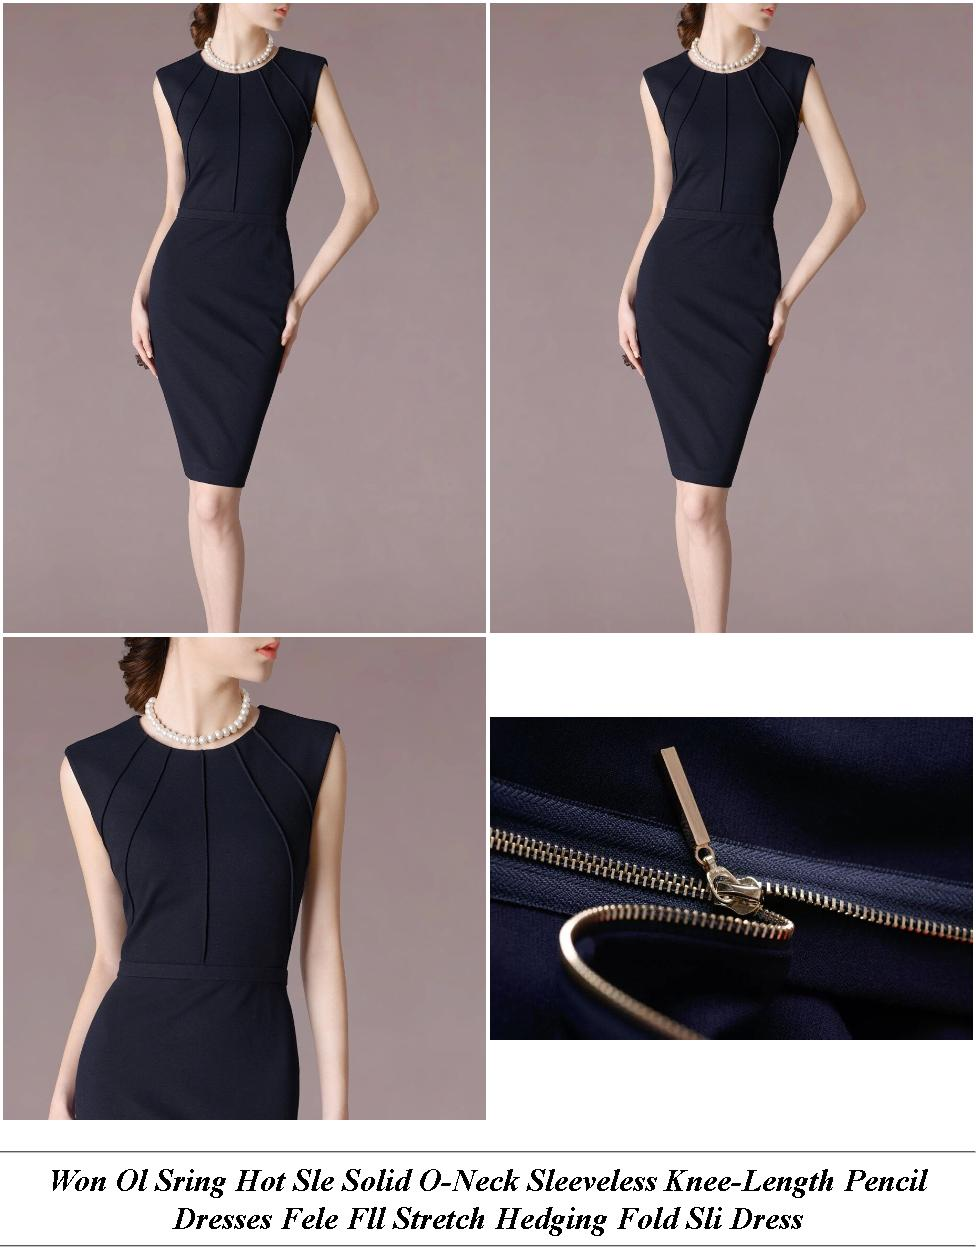 Girls Dresses - Women For Sale - Ross Dress For Less - Cheap Womens Summer Clothes